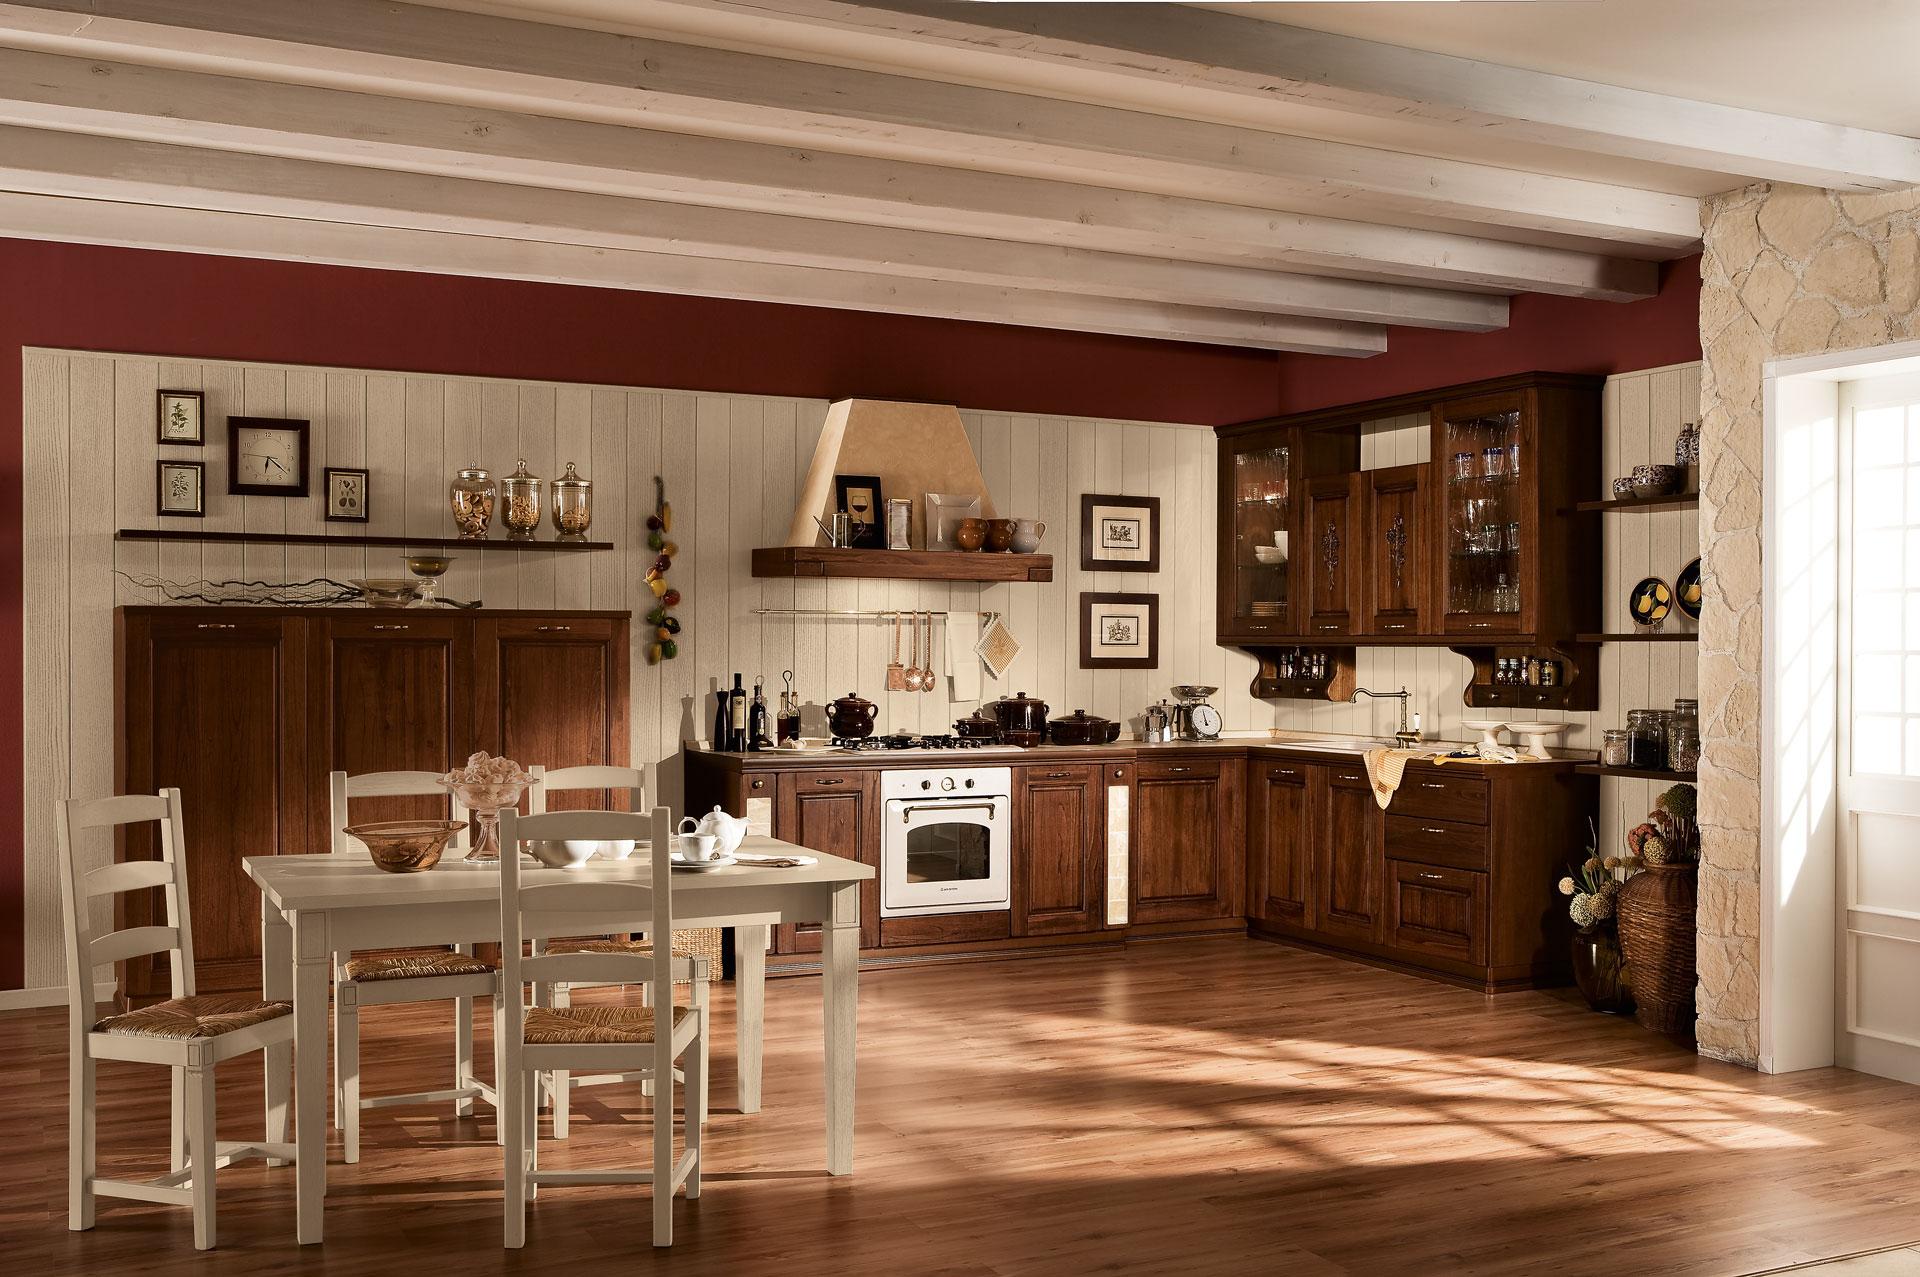 Cucine classiche antares - Cucine lineari classiche ...